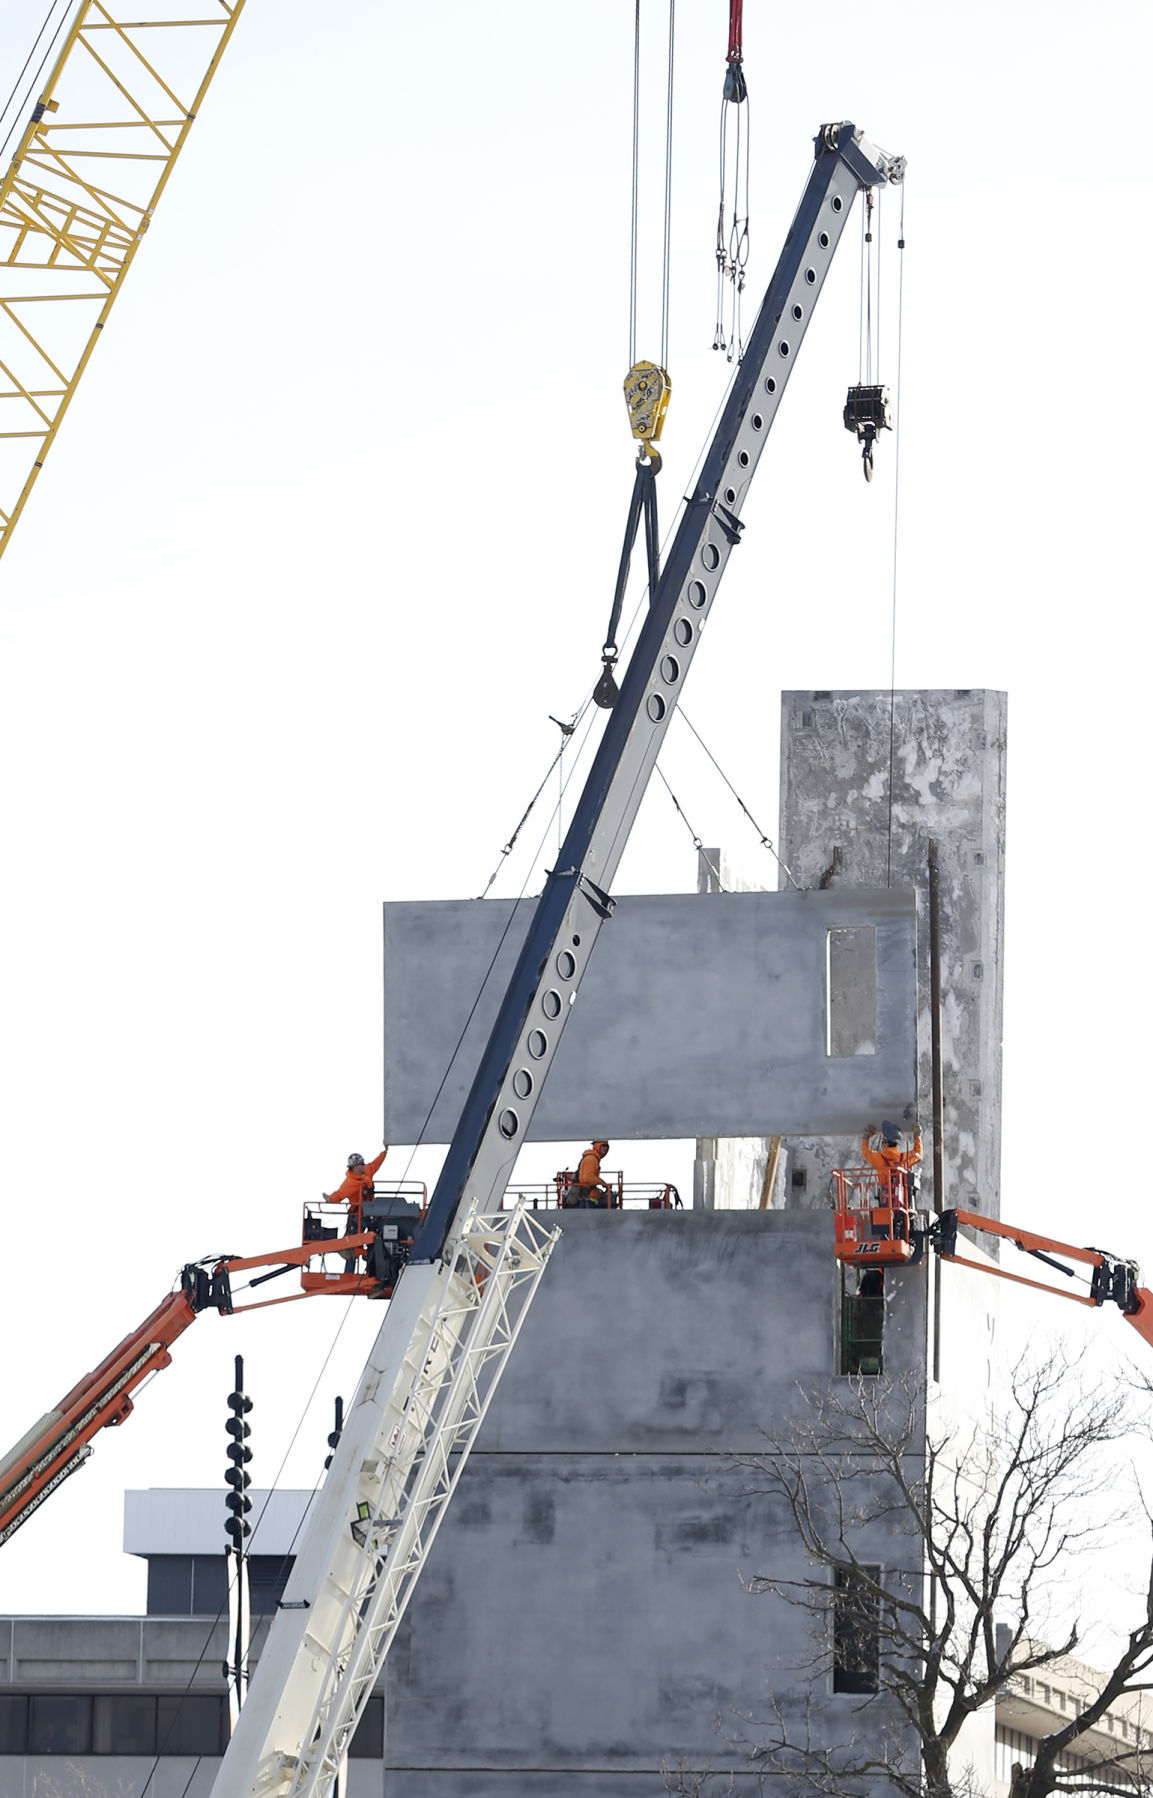 011618bp-art-block-construction